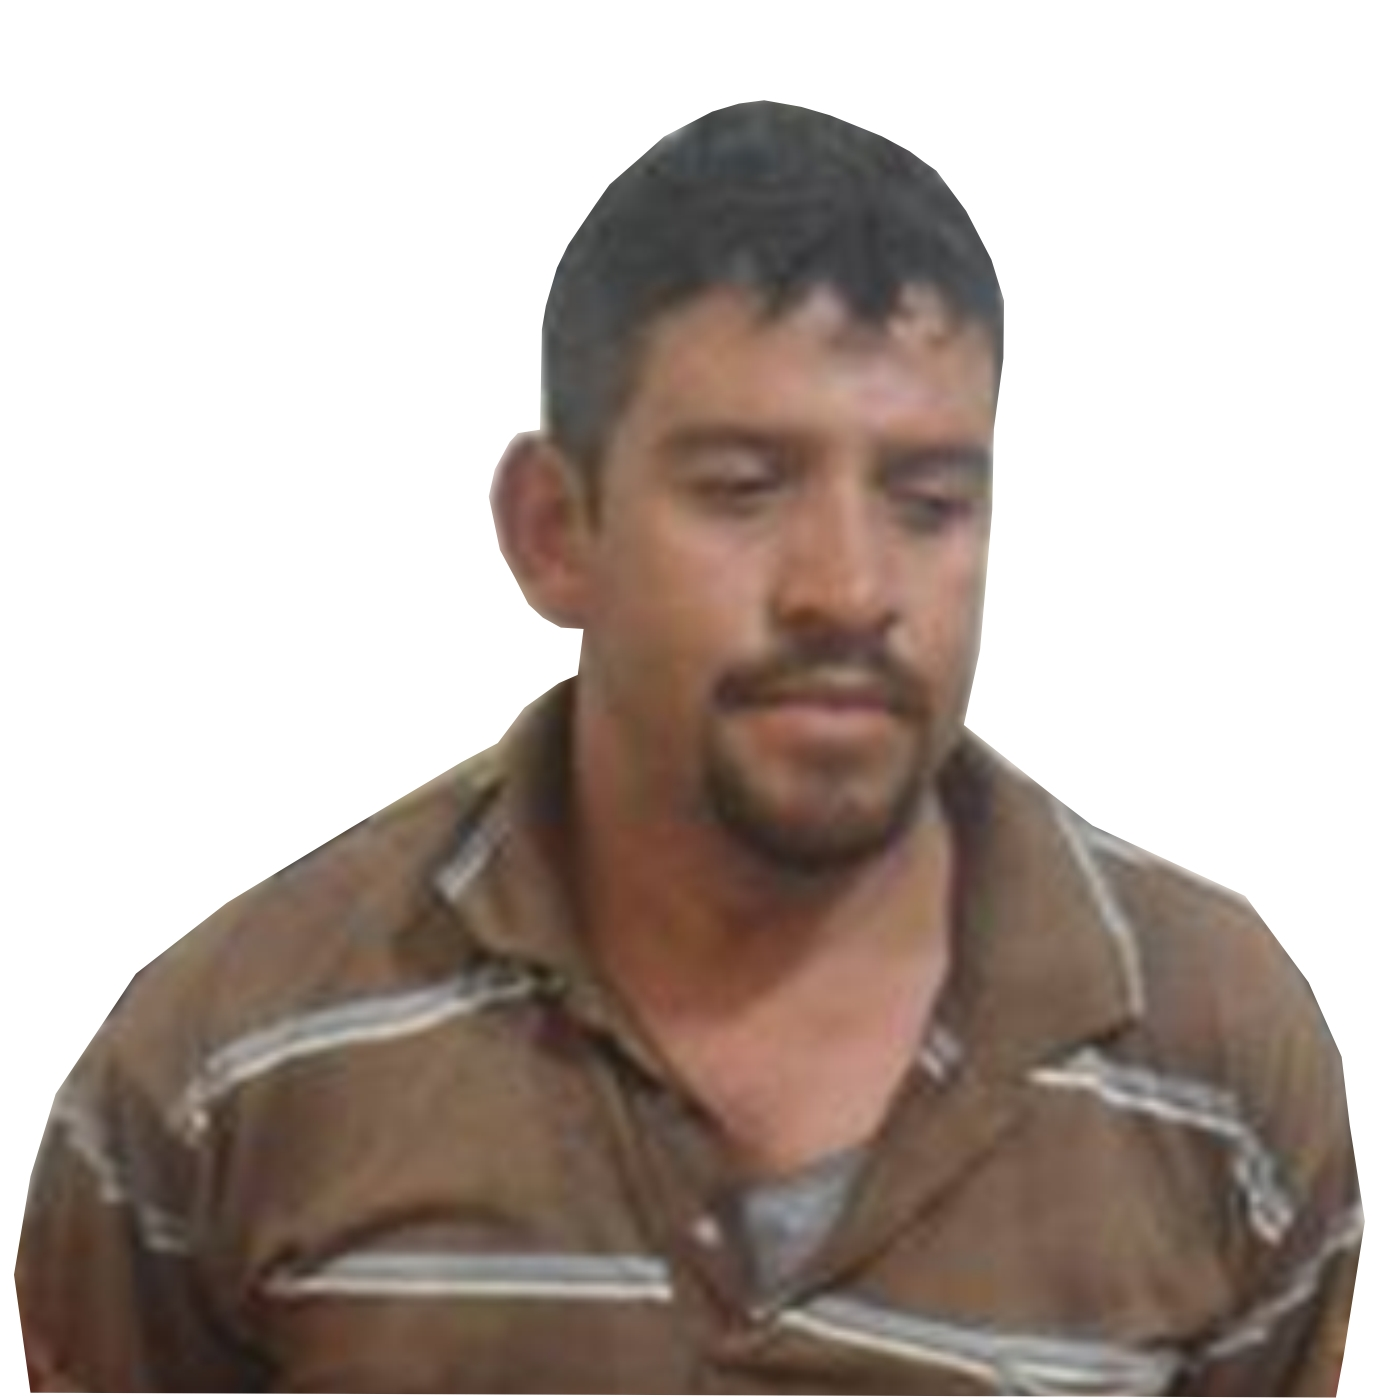 GABRIEL ESPARZA SALAZAR